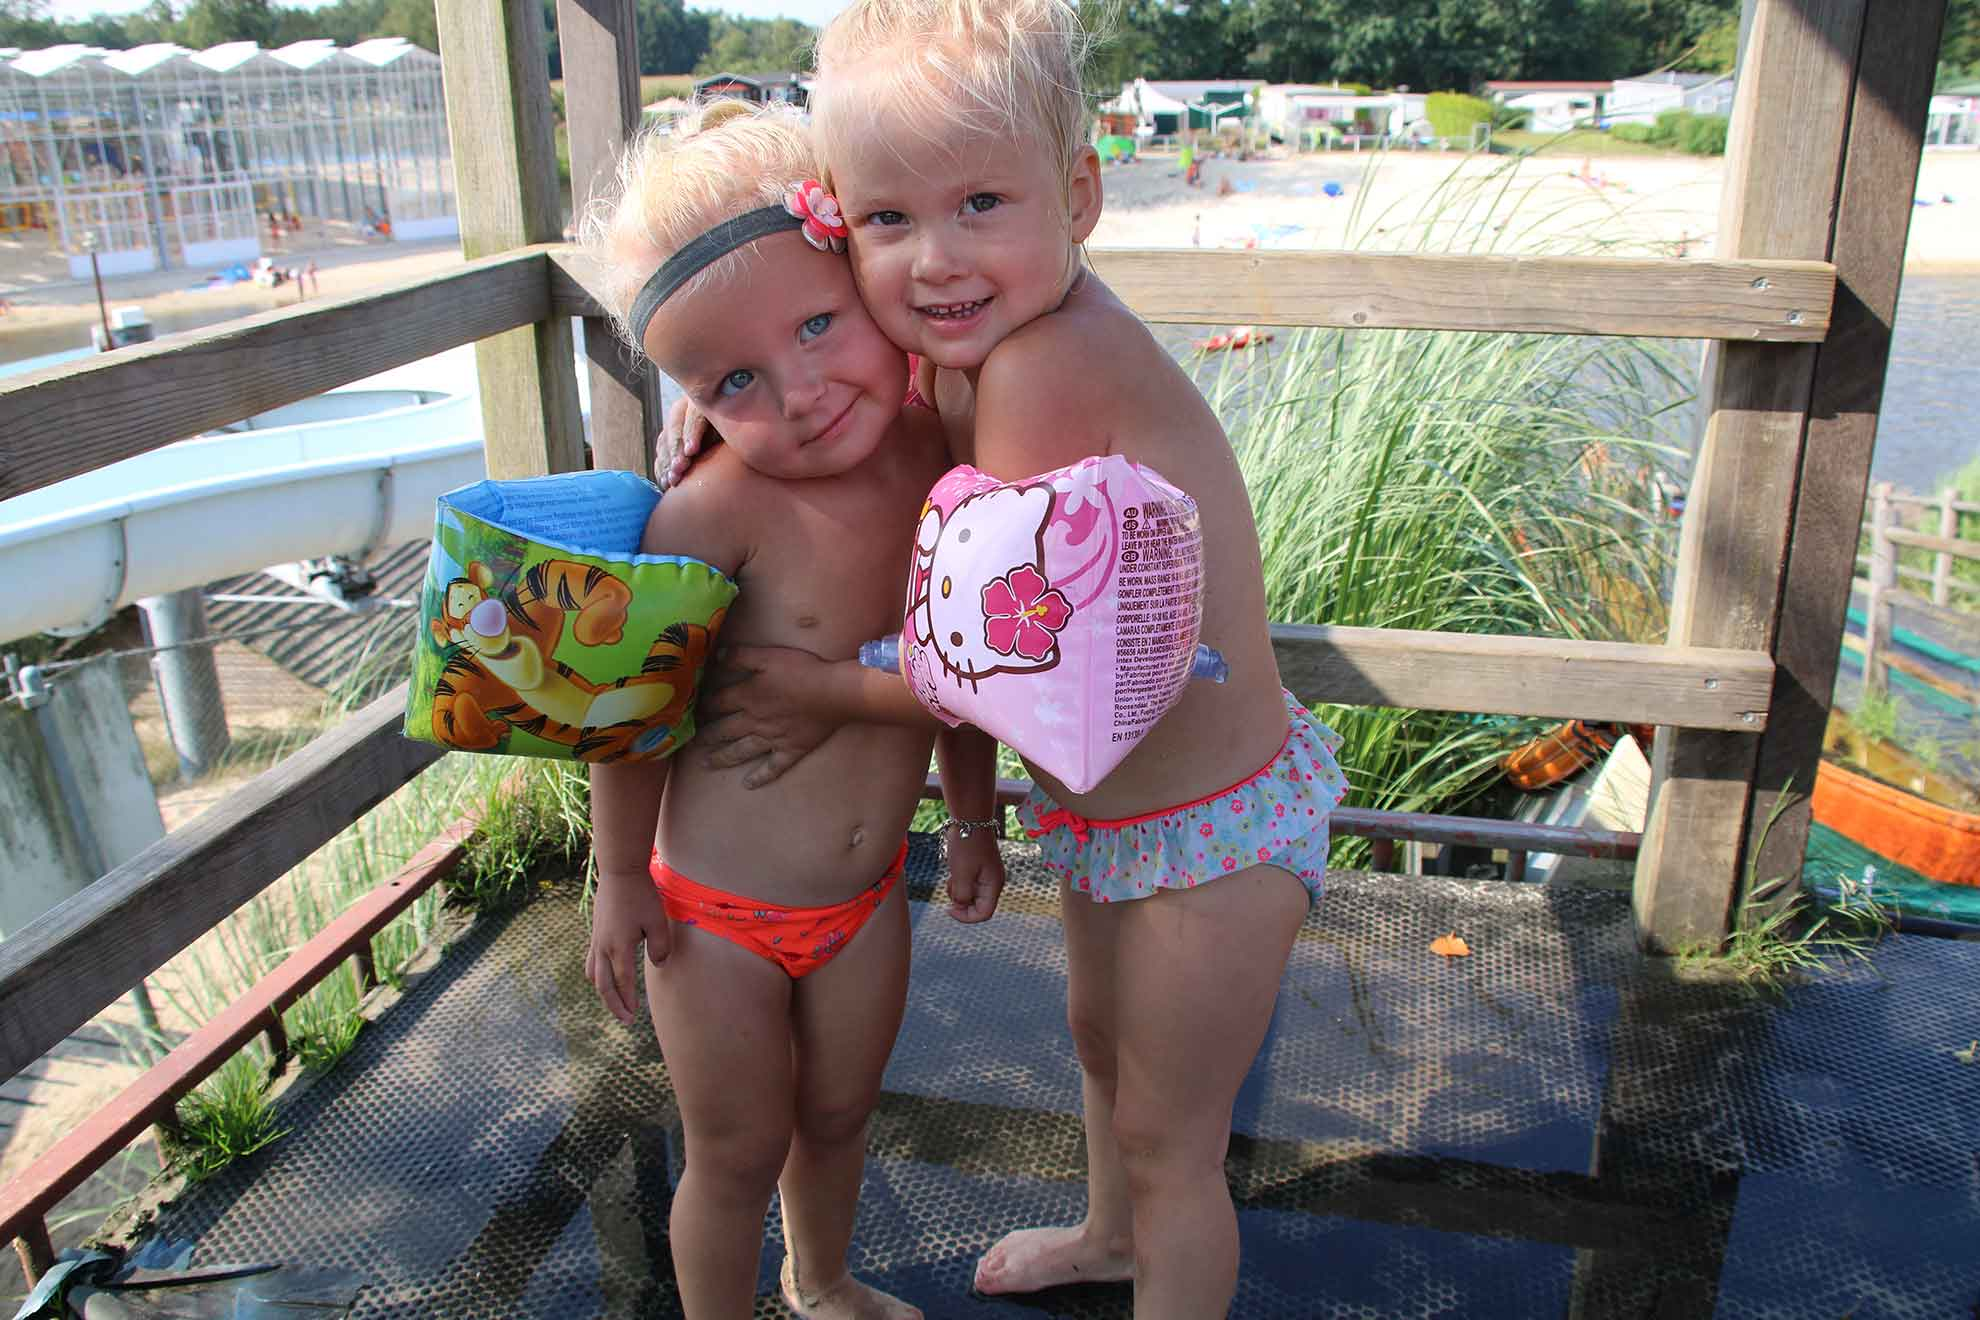 De leukste kinder vakantie in Nederland! - Kinder vakantie in Nederland